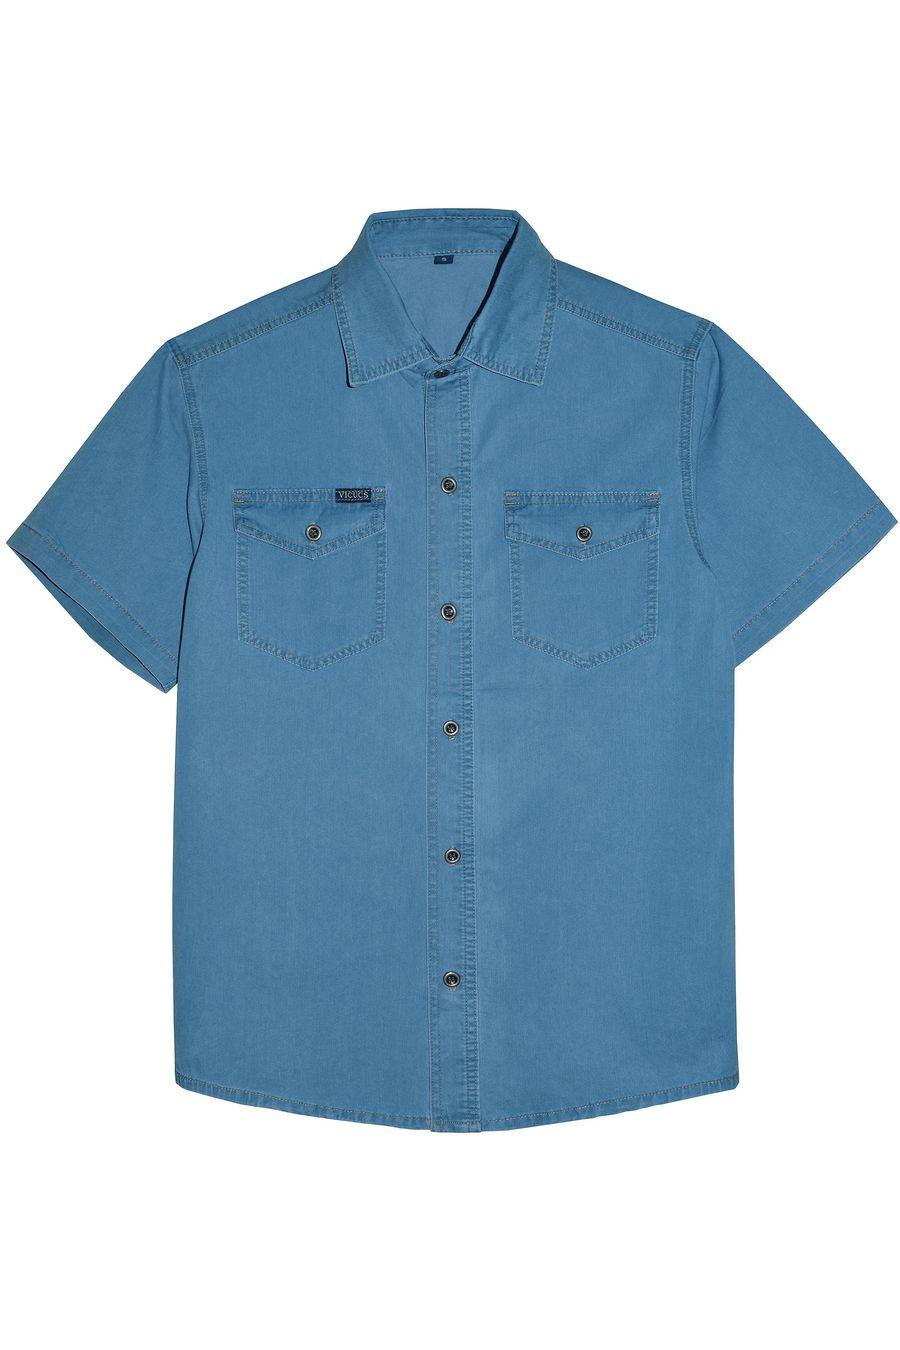 Рубашка мужская Vicucs 728E/CT-321-21 (XL-5XL) - фото 1